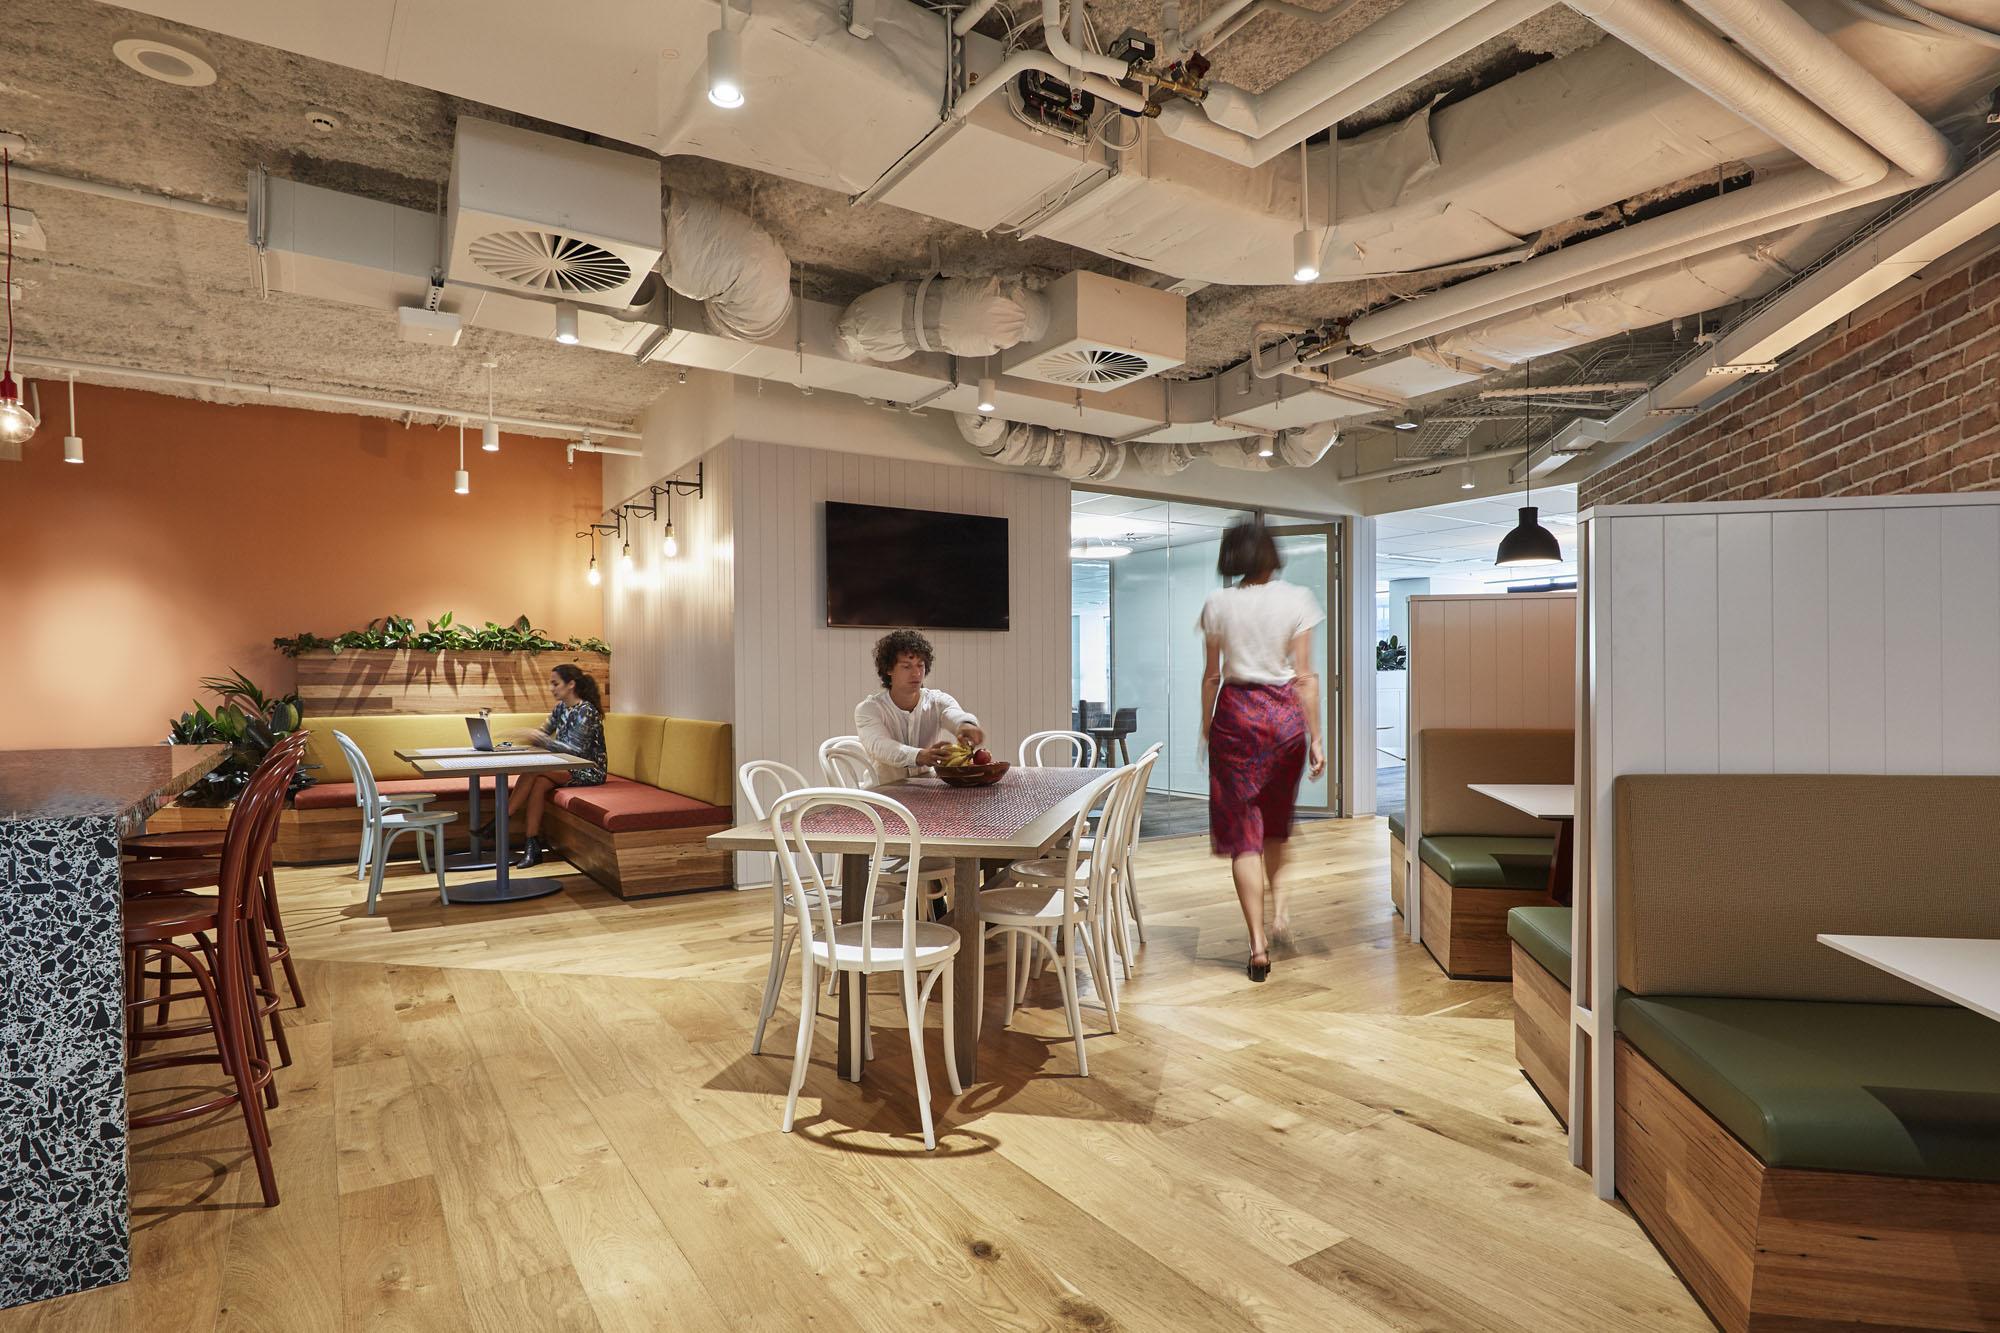 Commercial coatings for flooring / indoor wood